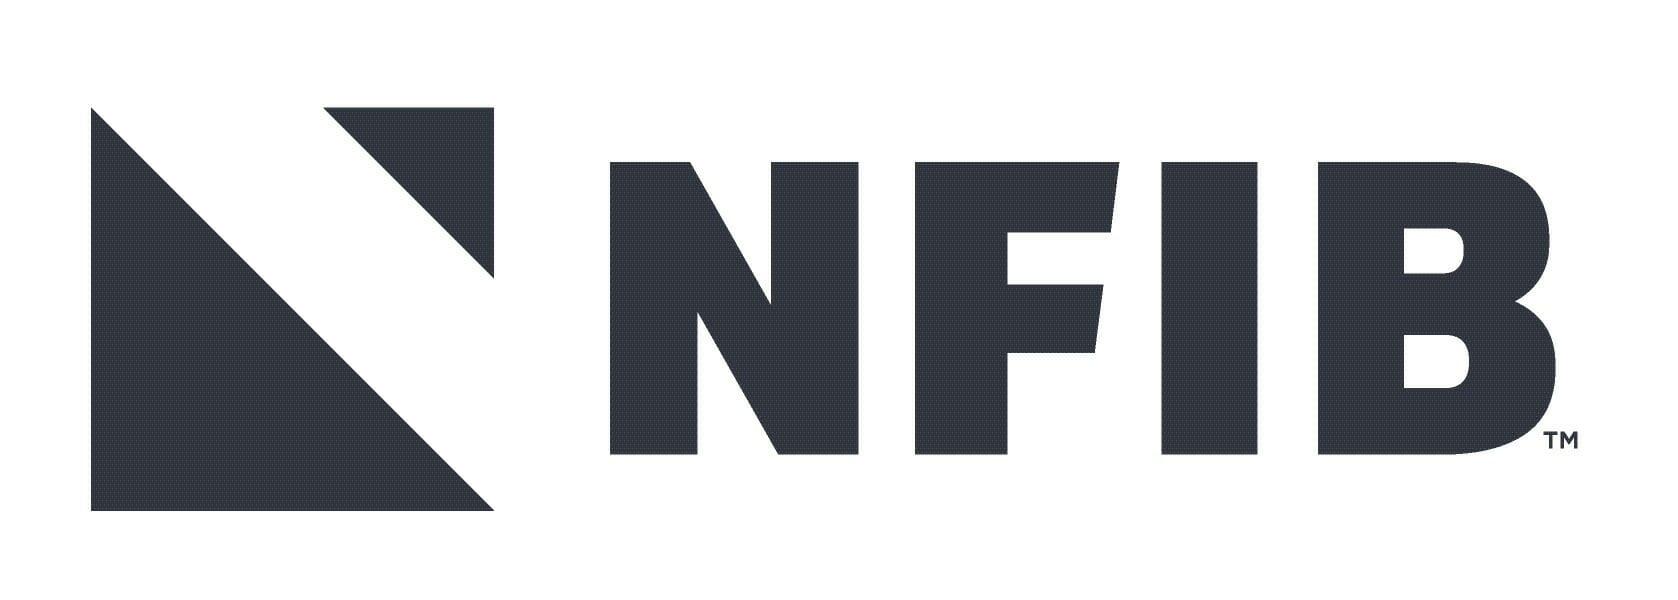 NFIB: Small Business Association NY